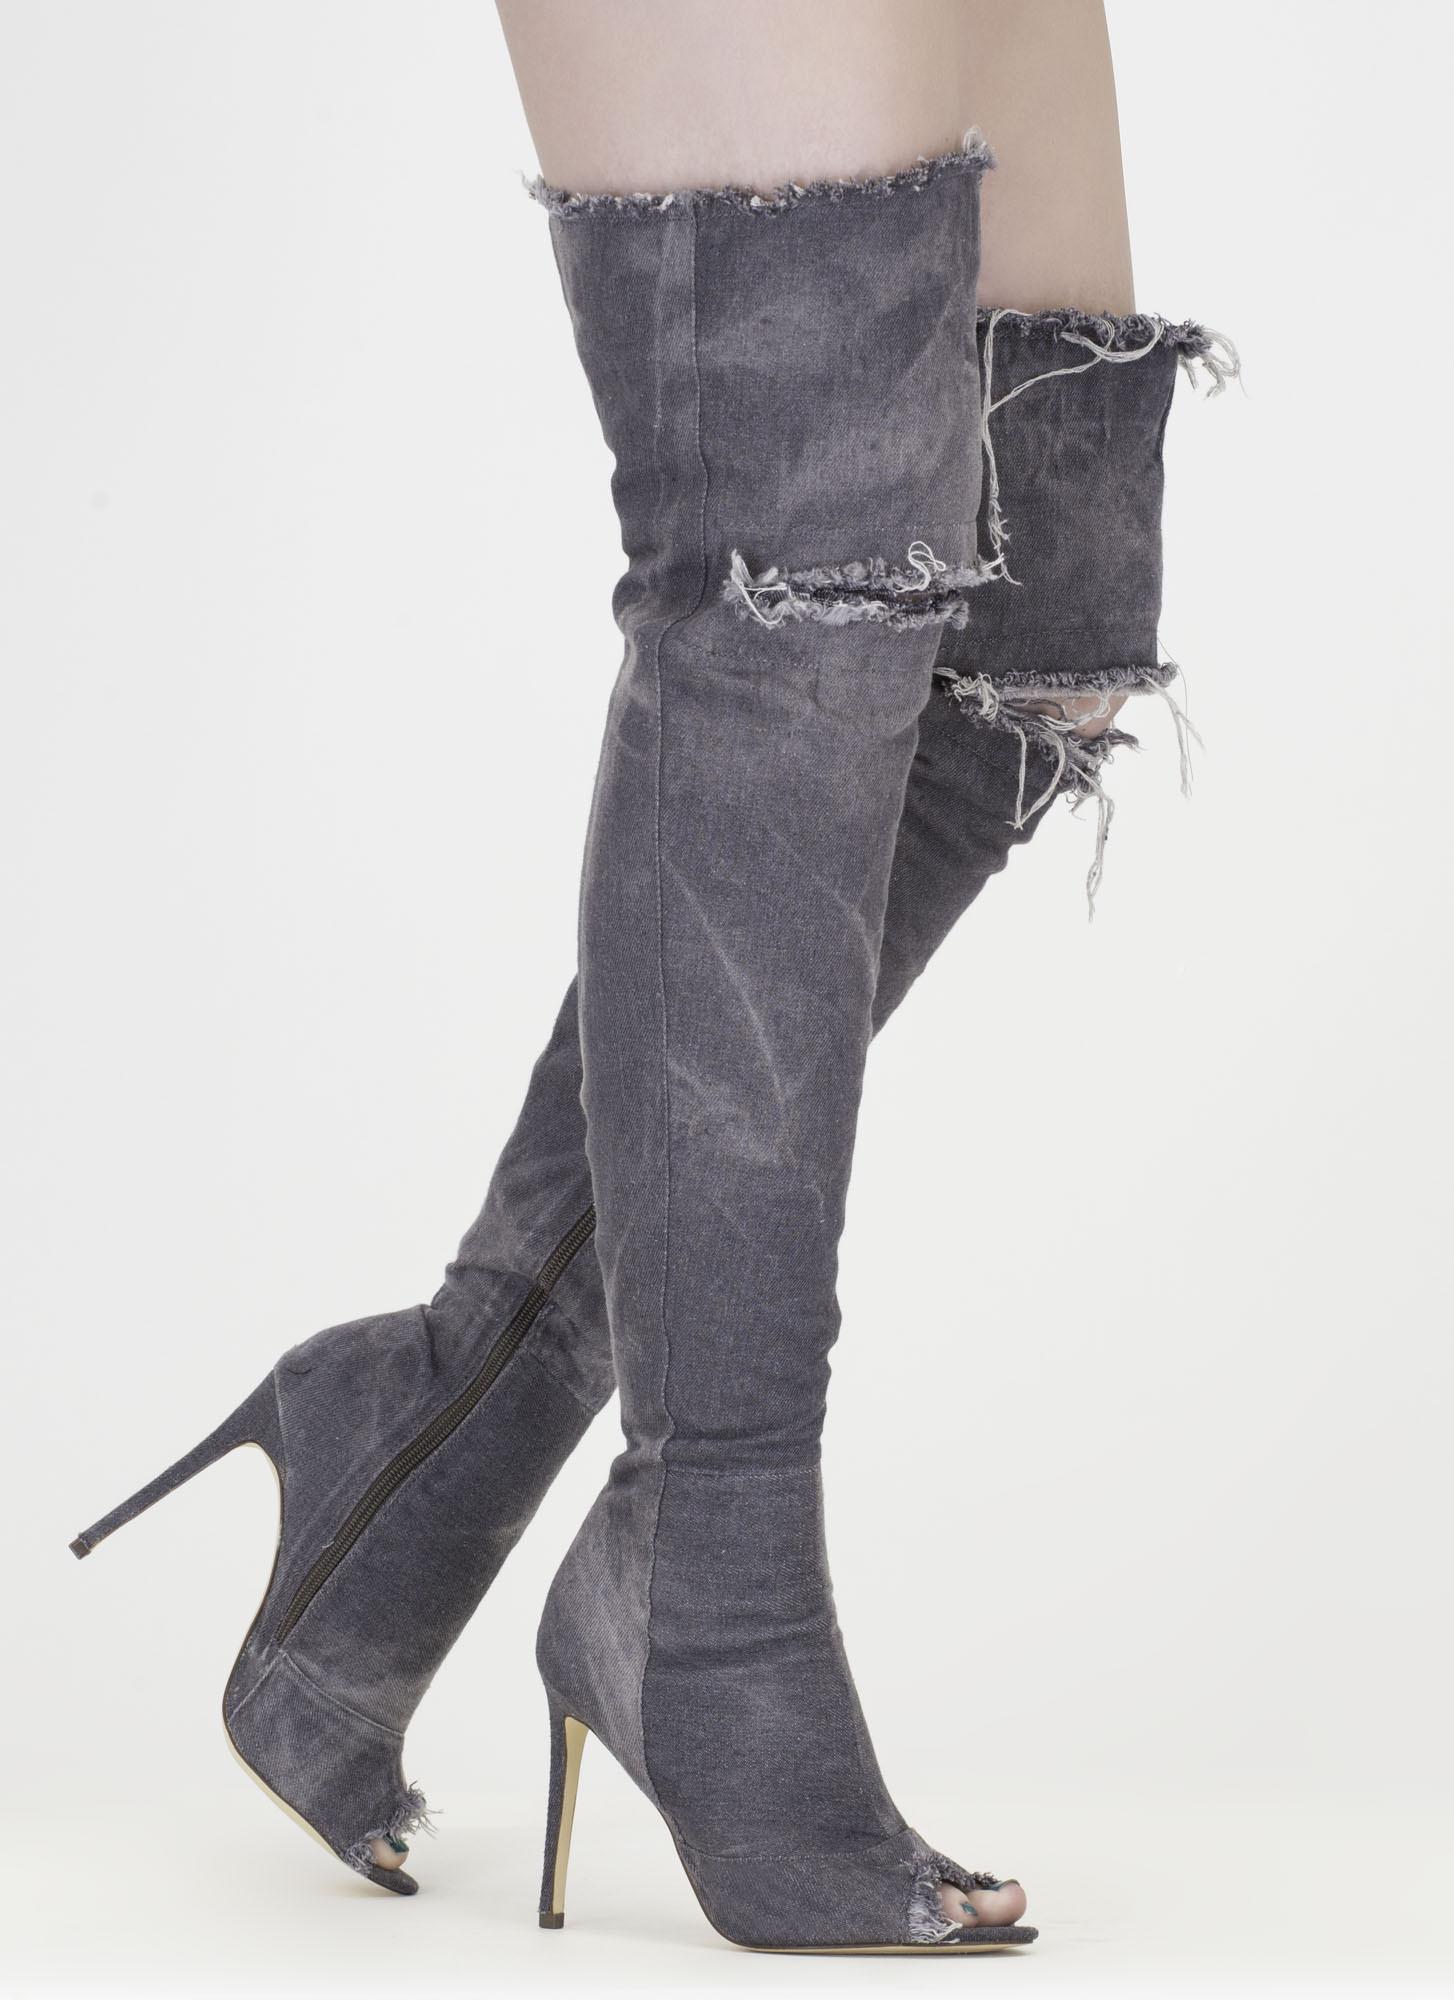 Signal Denim Thigh-High Boots GREY BLACK MEDIUMBLUE BLUE - GoJane.com